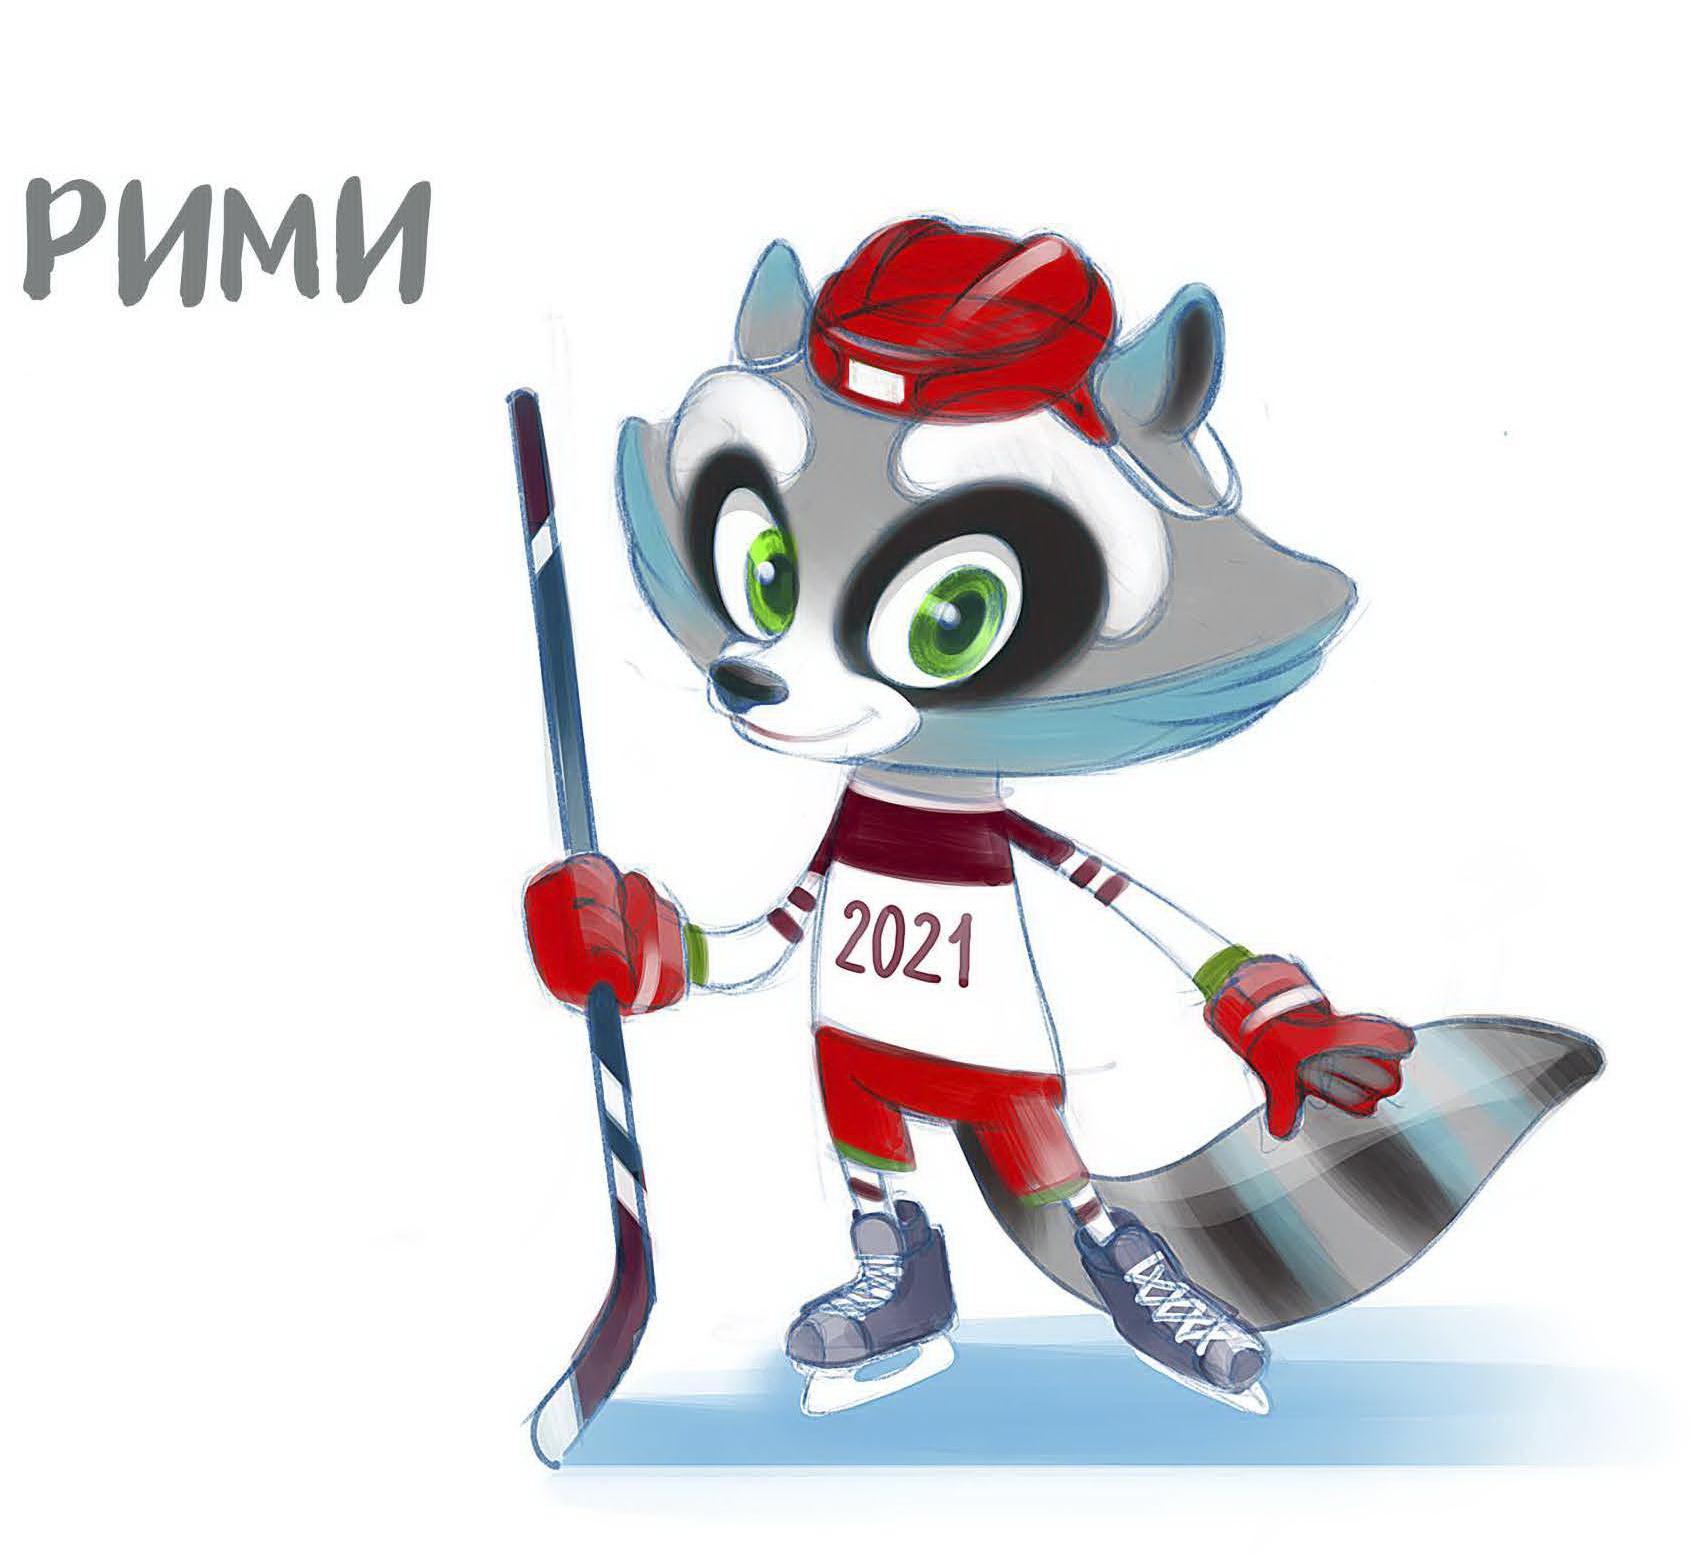 В Минске представили талисман Чемпионата мира по хоккею 2021 года